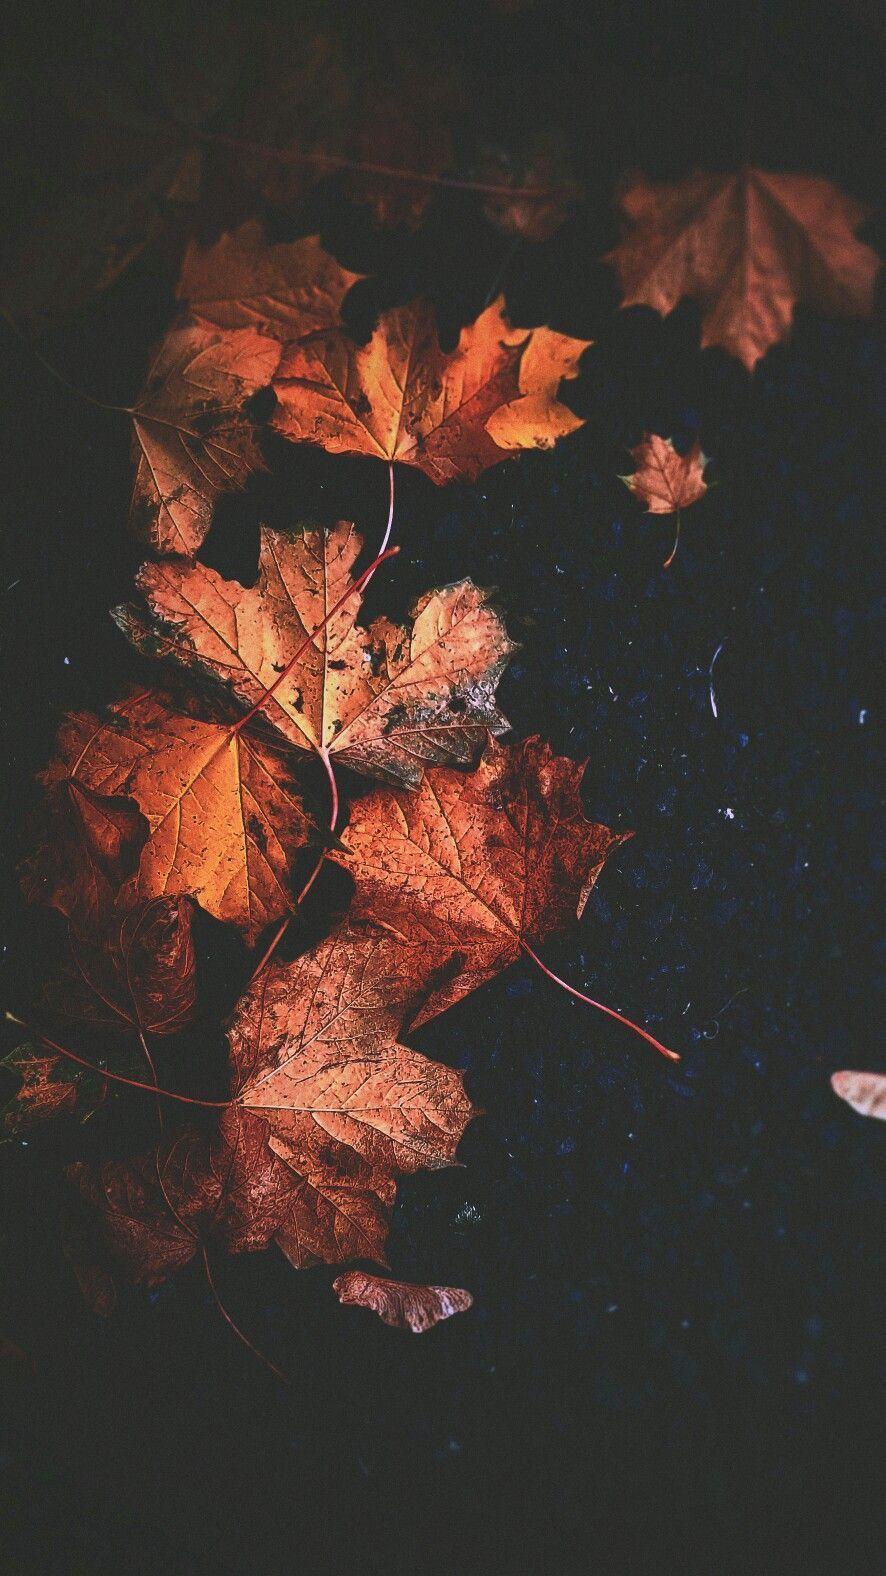 Fallwallpaperiphone Fallwallpaperiphone Fallwallpaperiphone Autumn Wallpaper Hd Cute Fall Wallpaper Iphone Wallpaper Fall